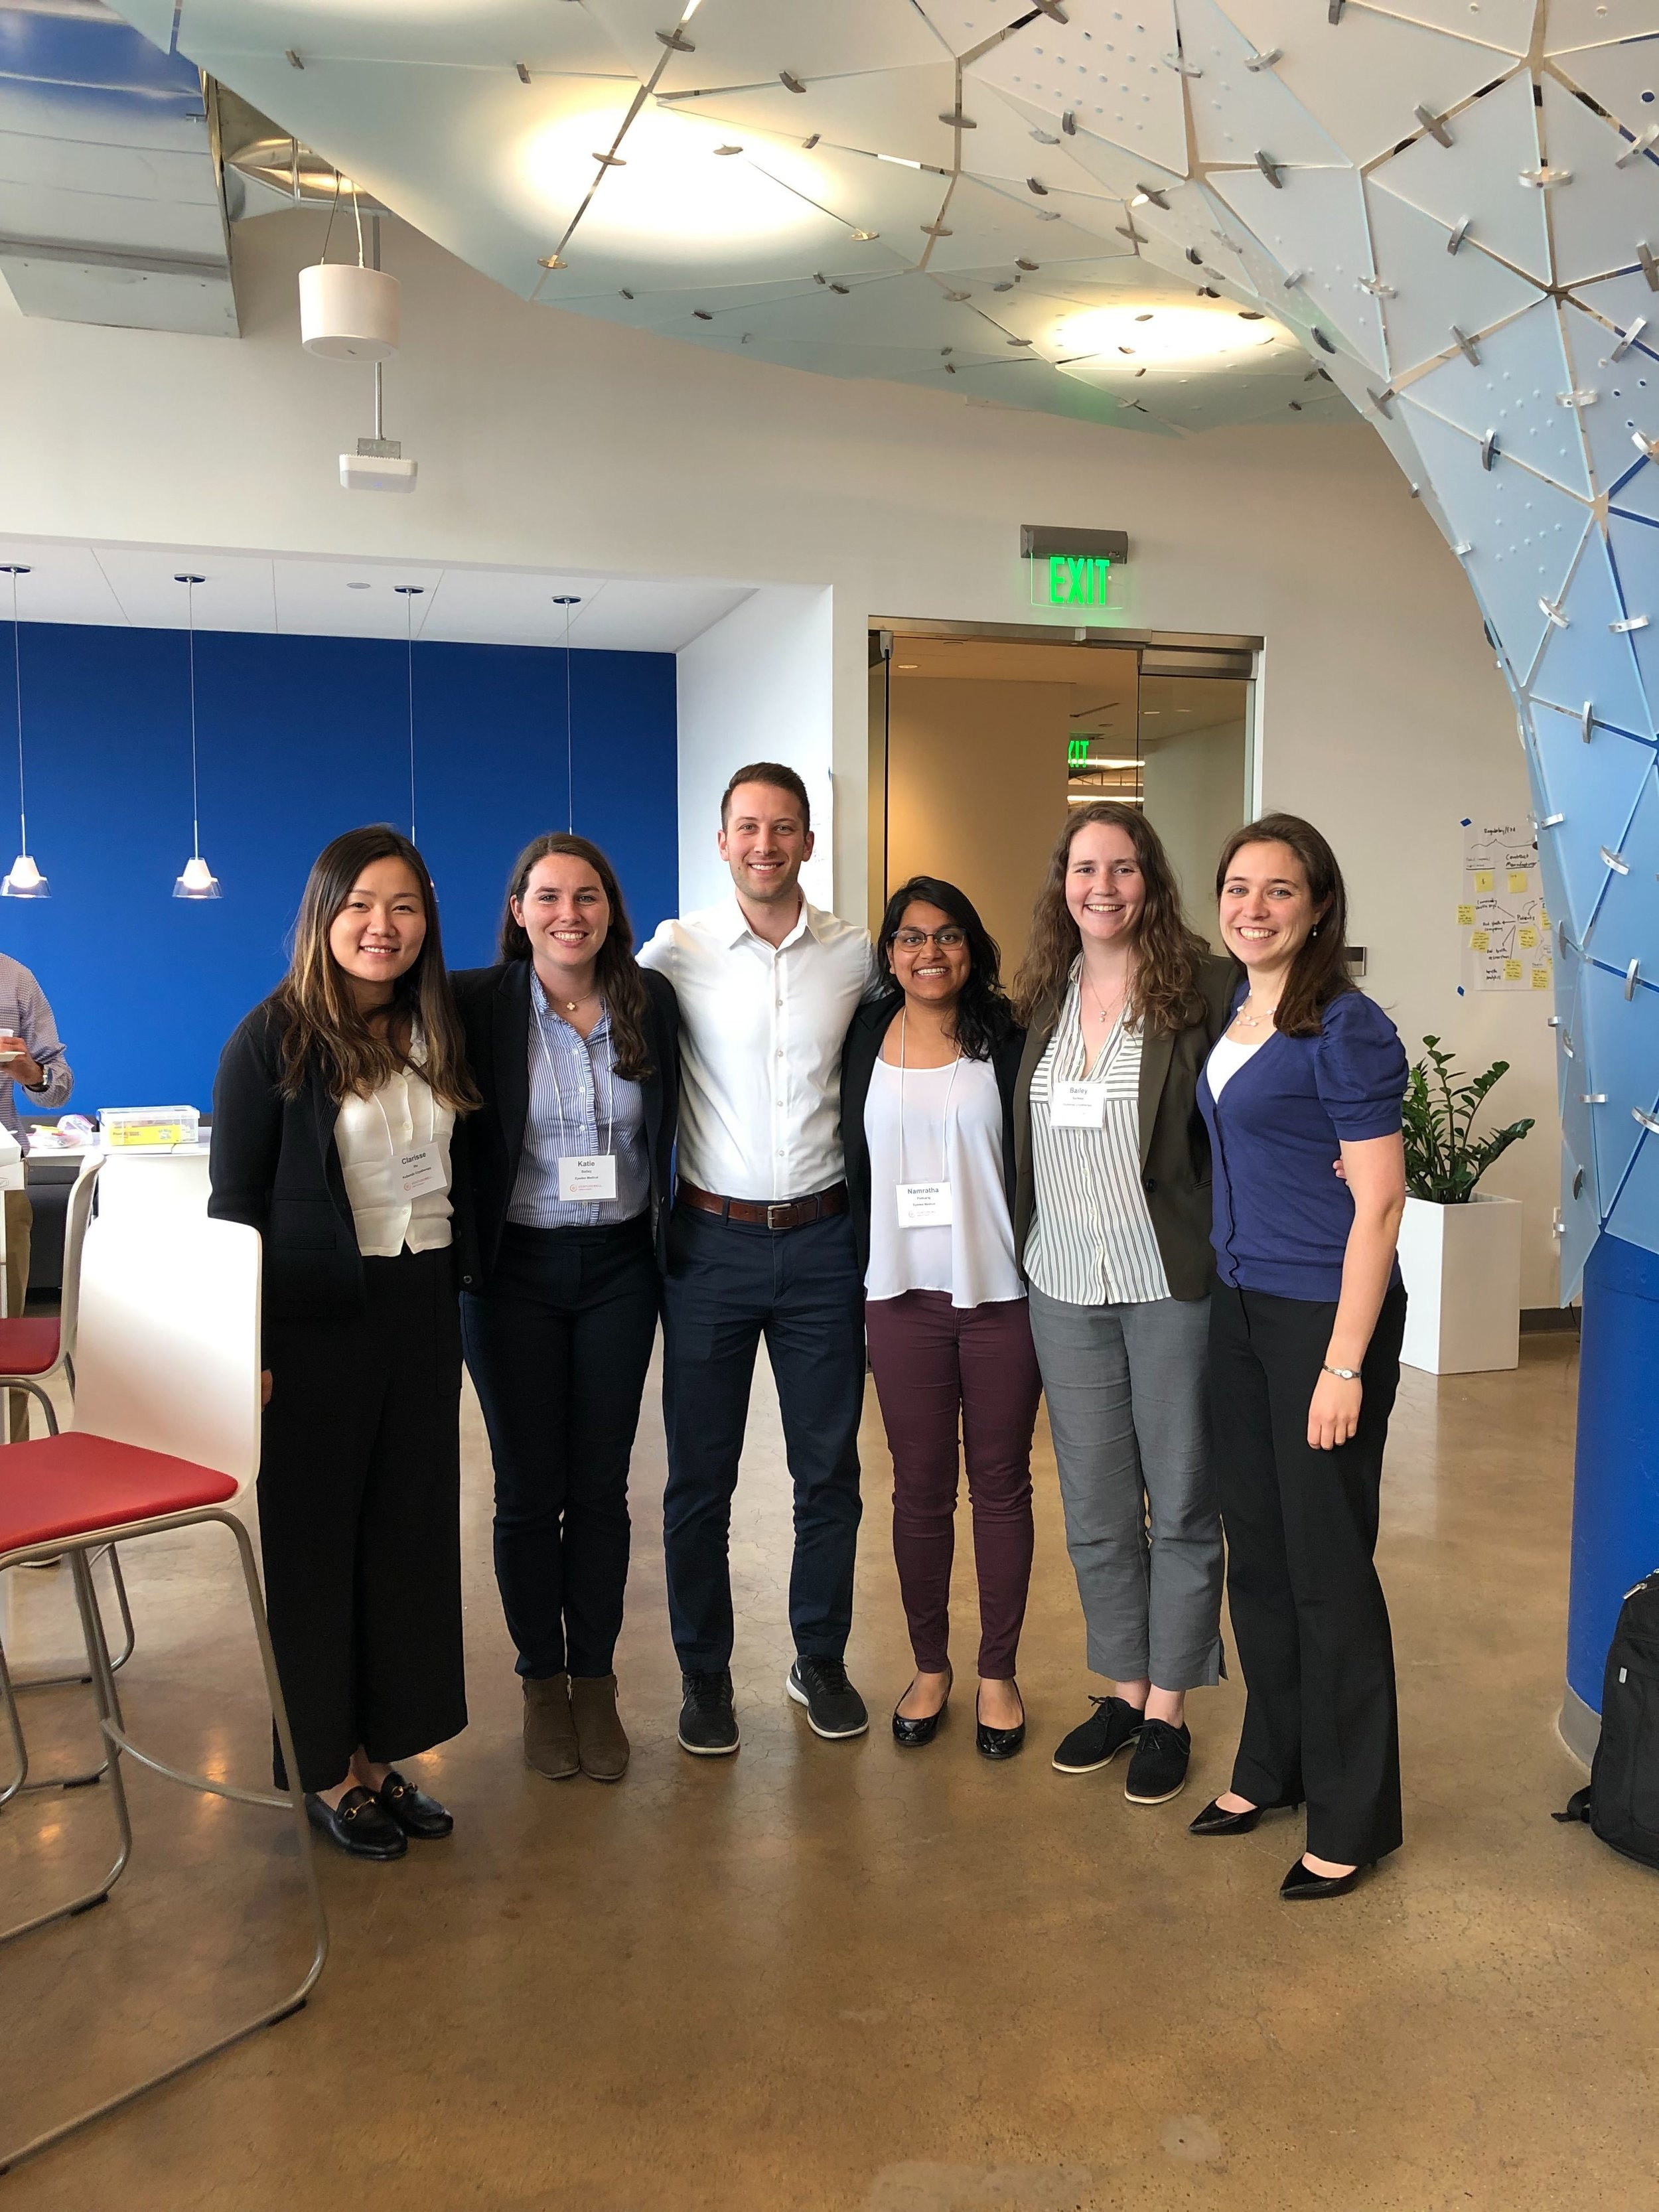 Sam and Rebecca mentoring VentureWell start-ups